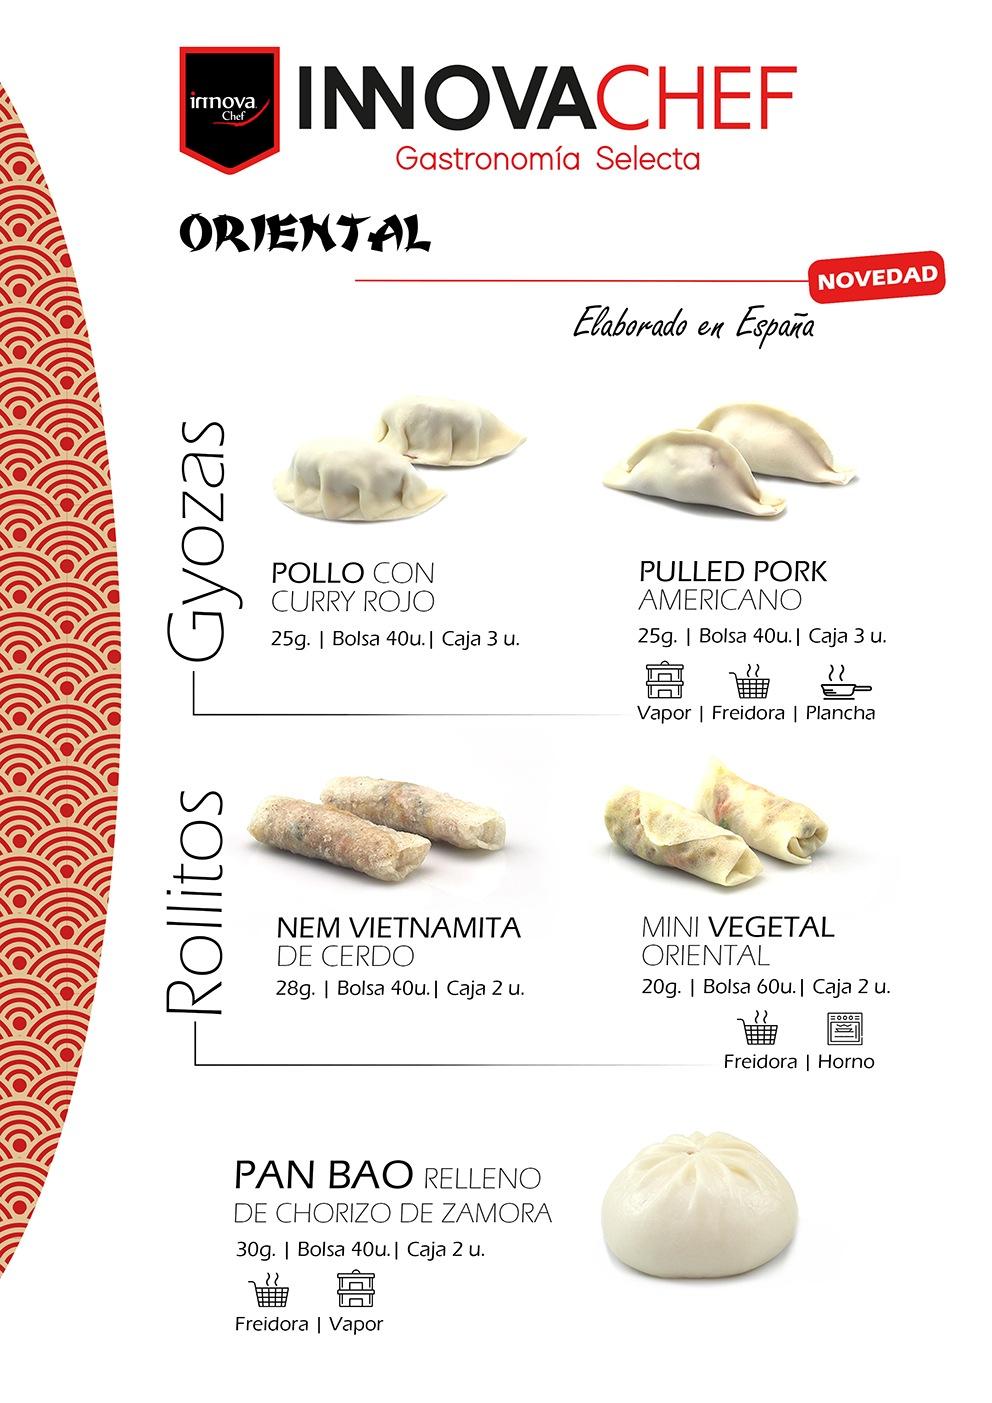 gyoza-bao-rollito-oriental